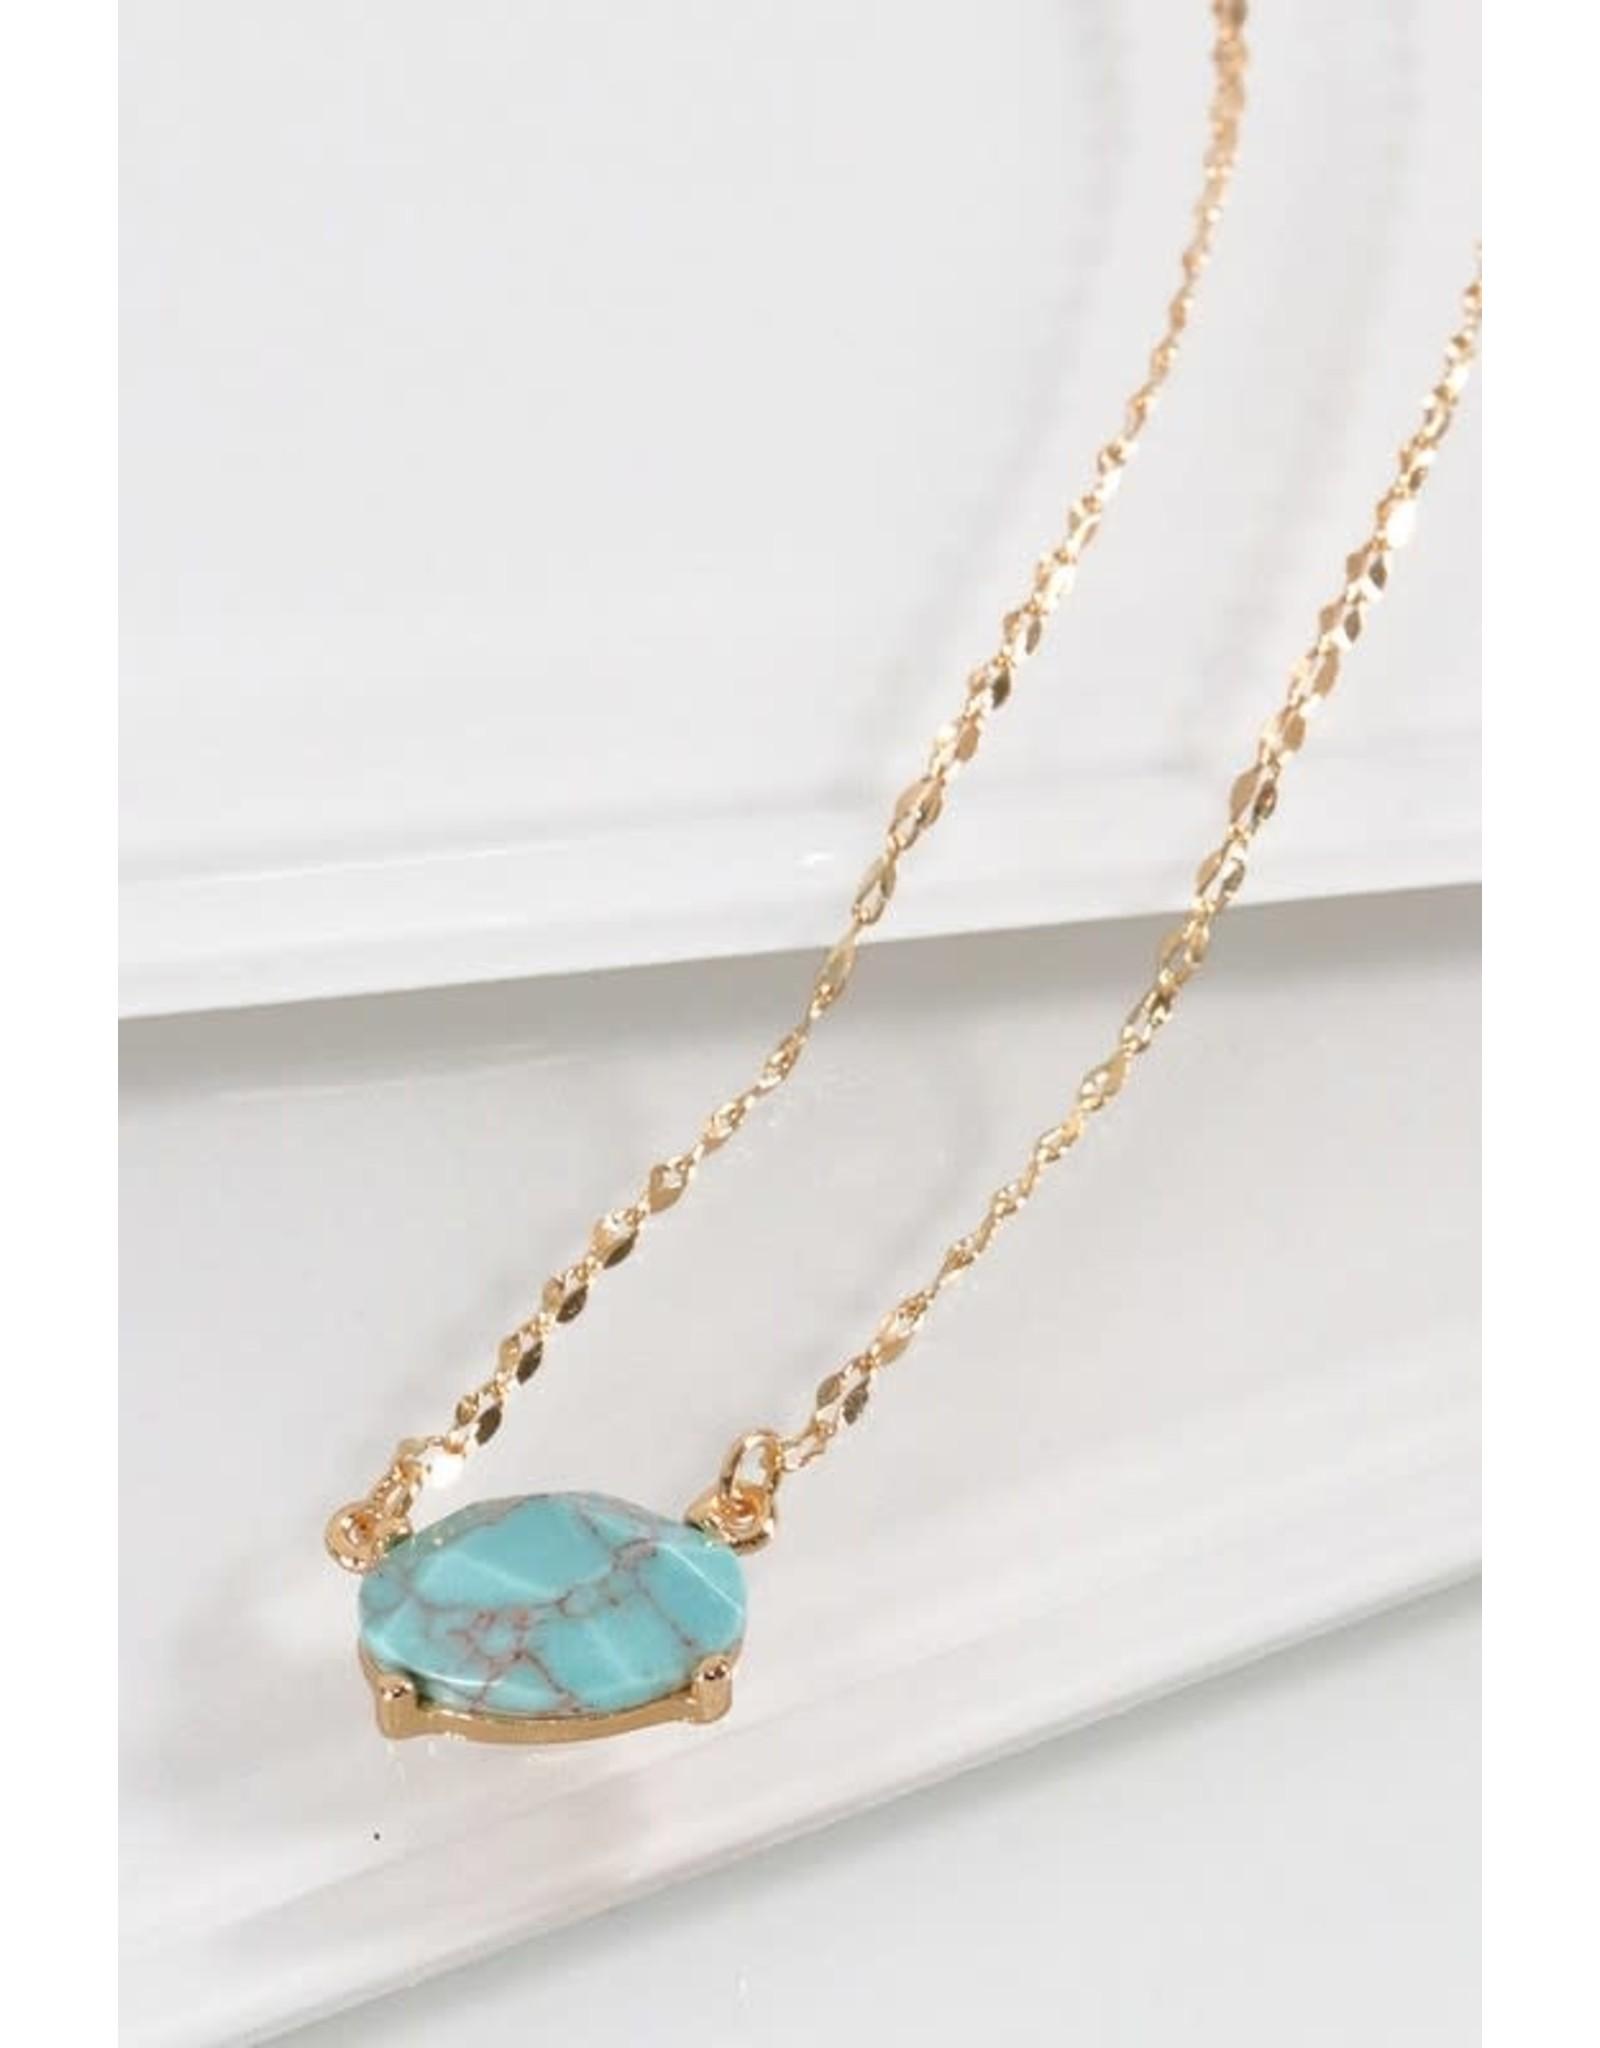 Oval Stone Necklace